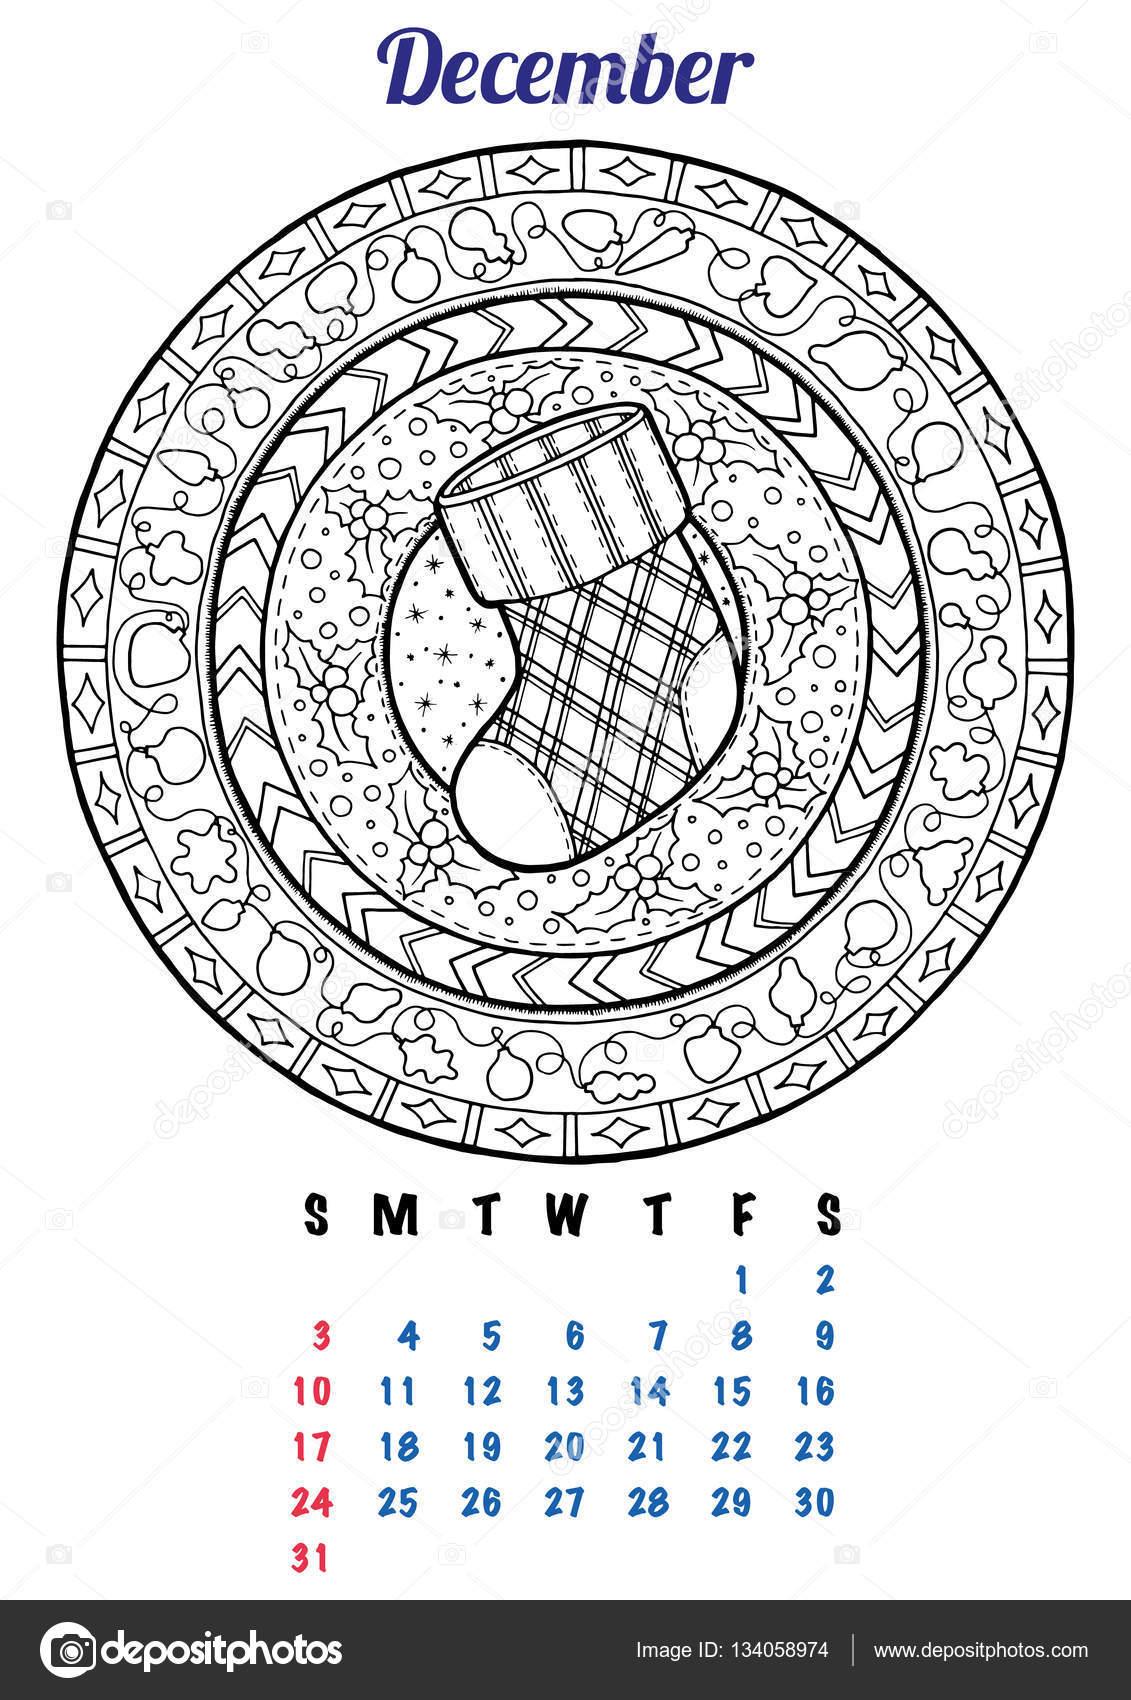 Gratis Kleurplaten Kerst Mandala.2017 December Kalender Planner Ontwerp Mandala Winter Nieuwjaar